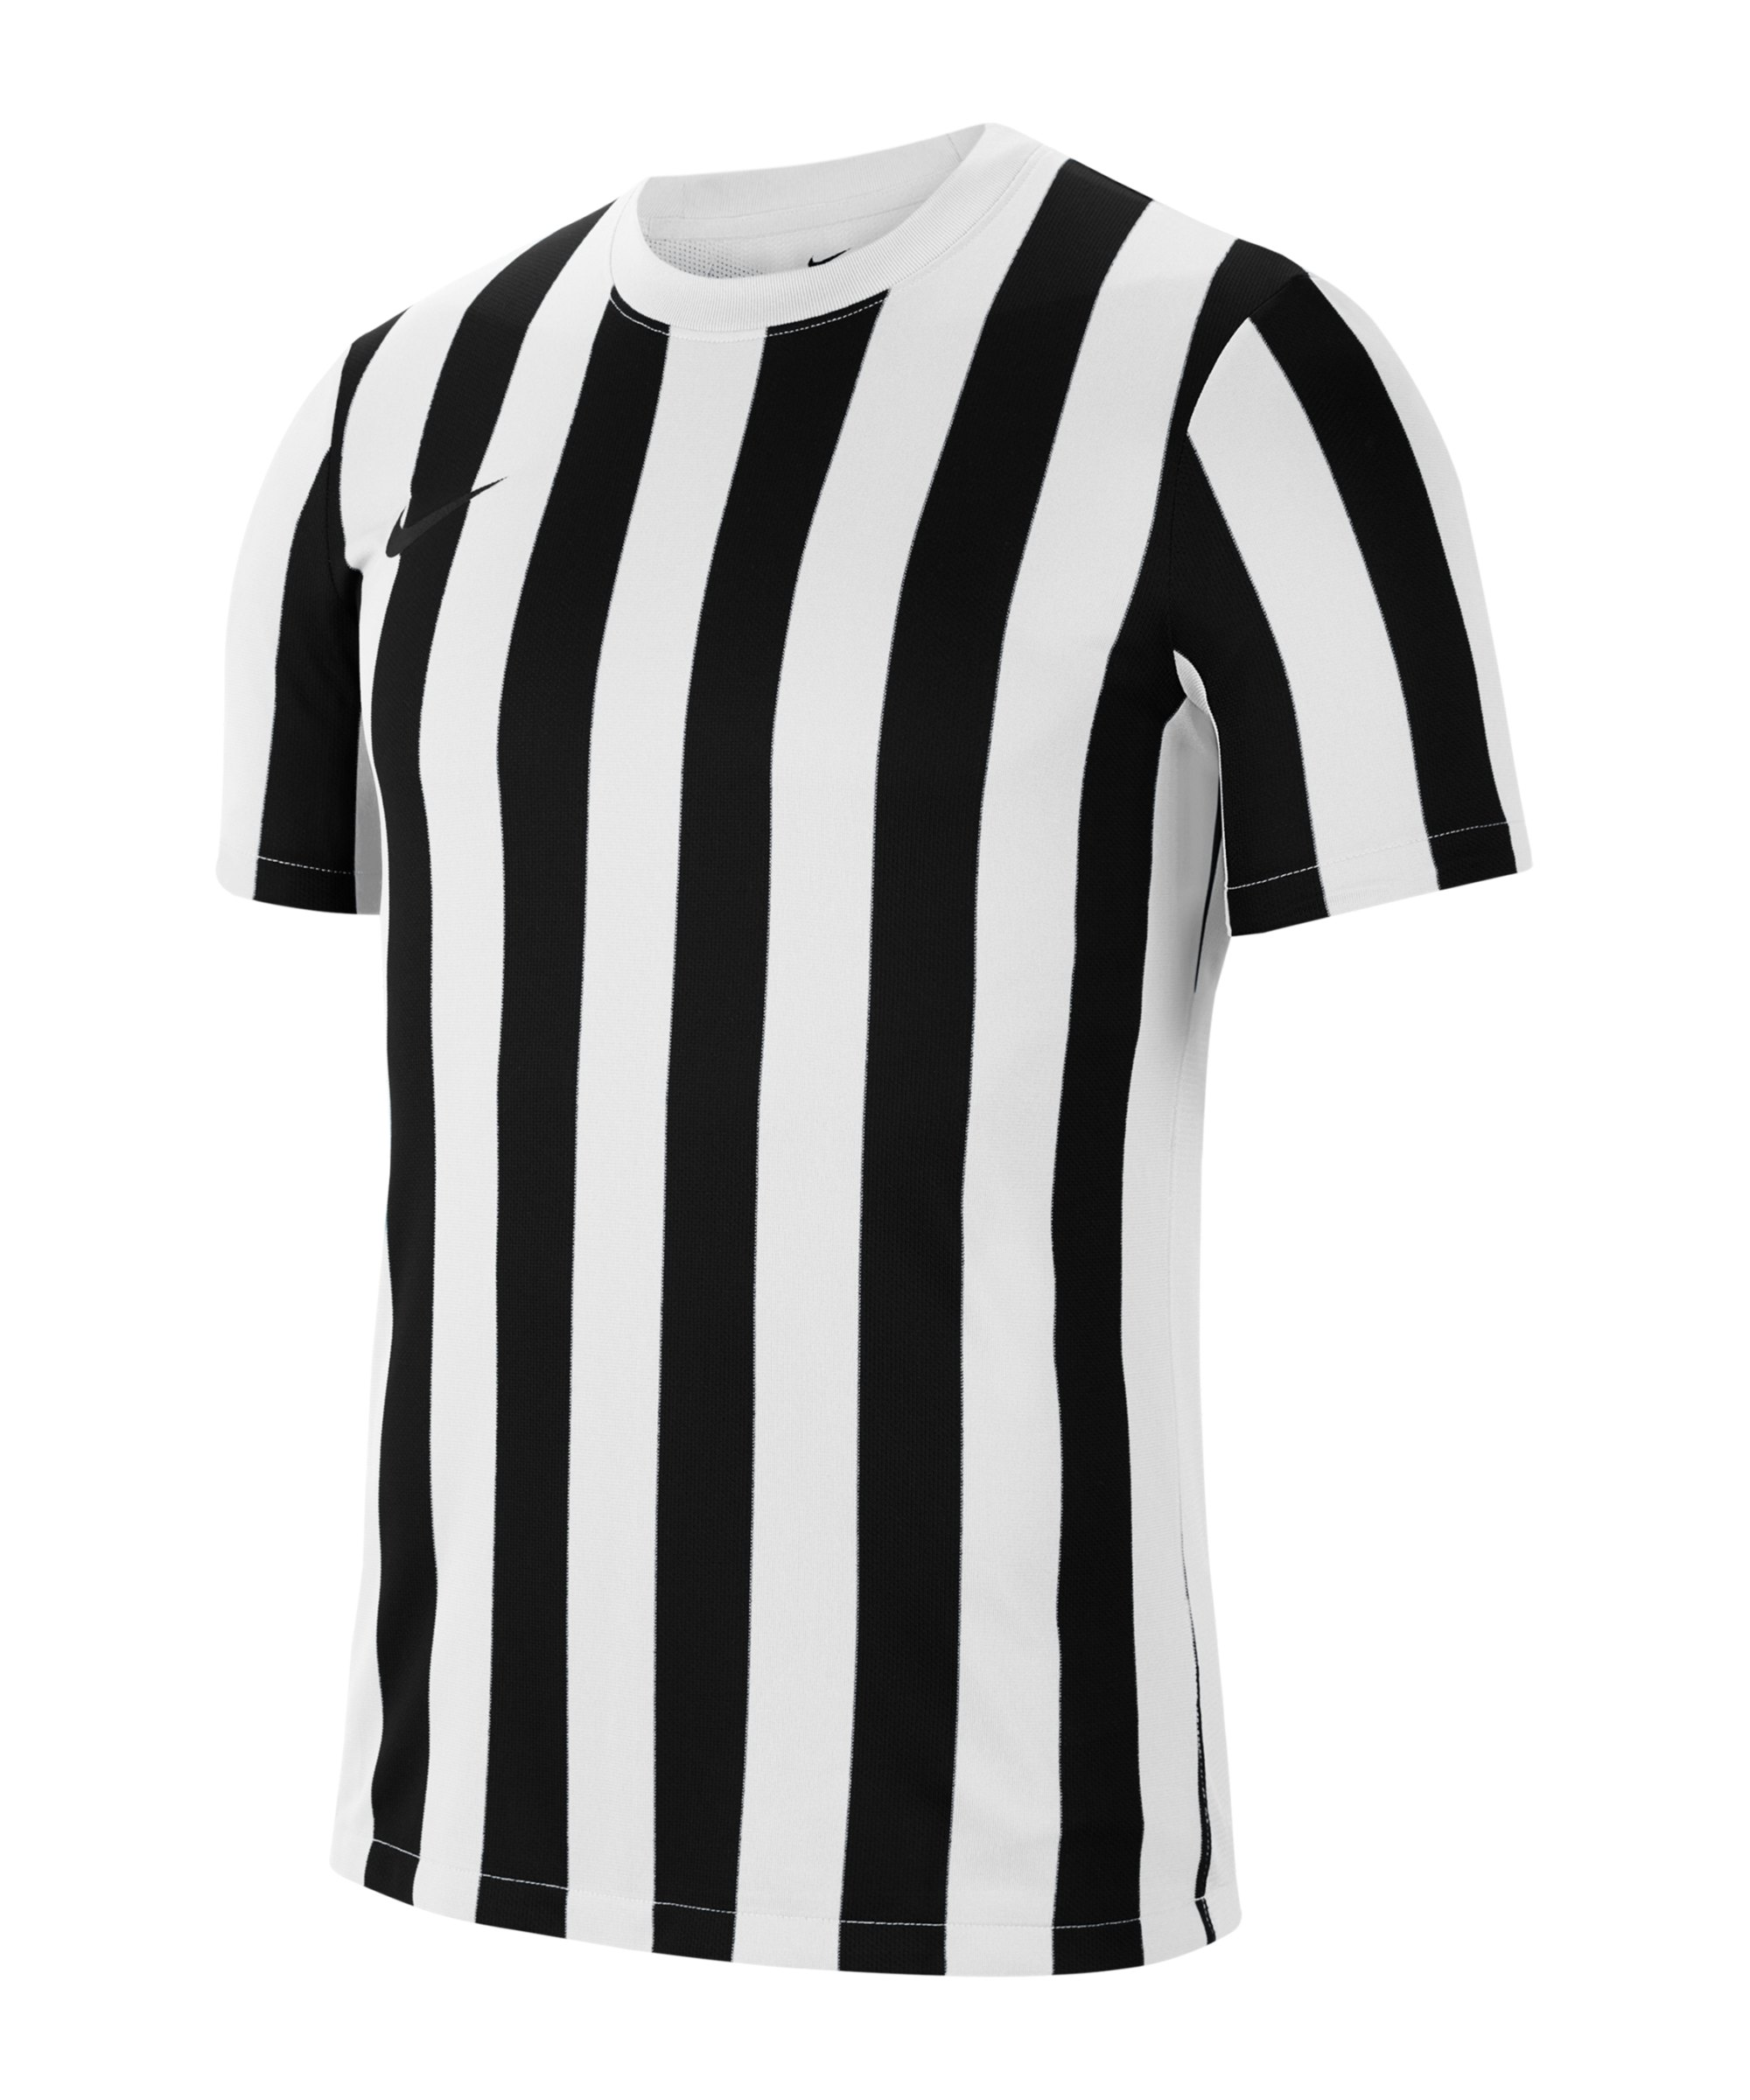 Nike Division IV Striped Trikot Kids F100 - weiss